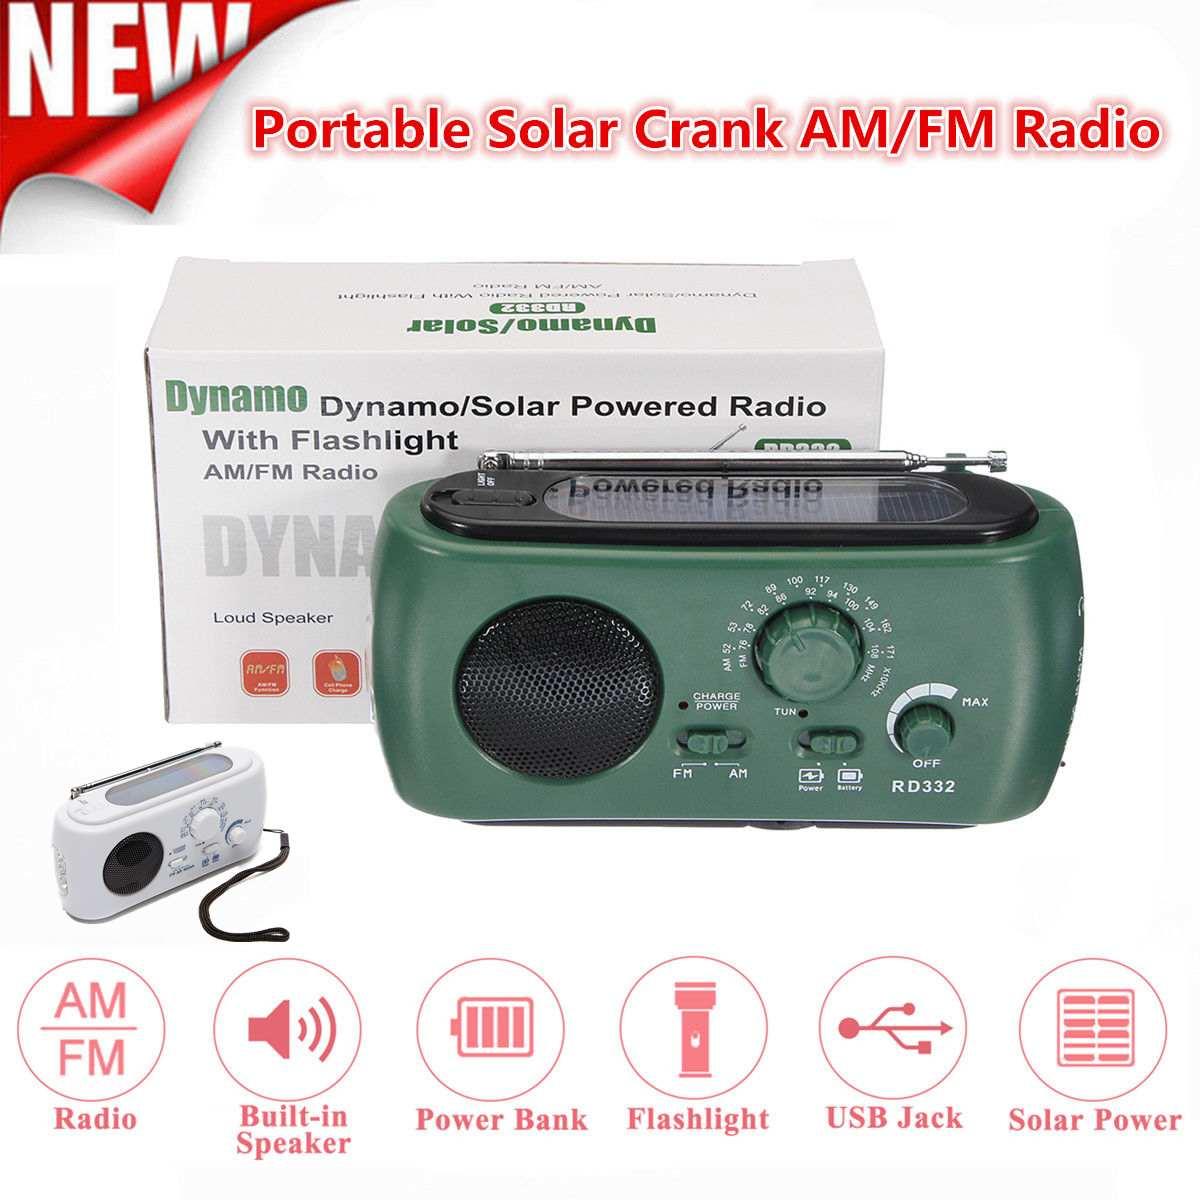 Unterhaltungselektronik Notfall Tragbare Solar Kurbel Am/fm Wetter Radio Mit Led Taschenlampe Mit Zelle Lade Interface Tragbares Audio & Video